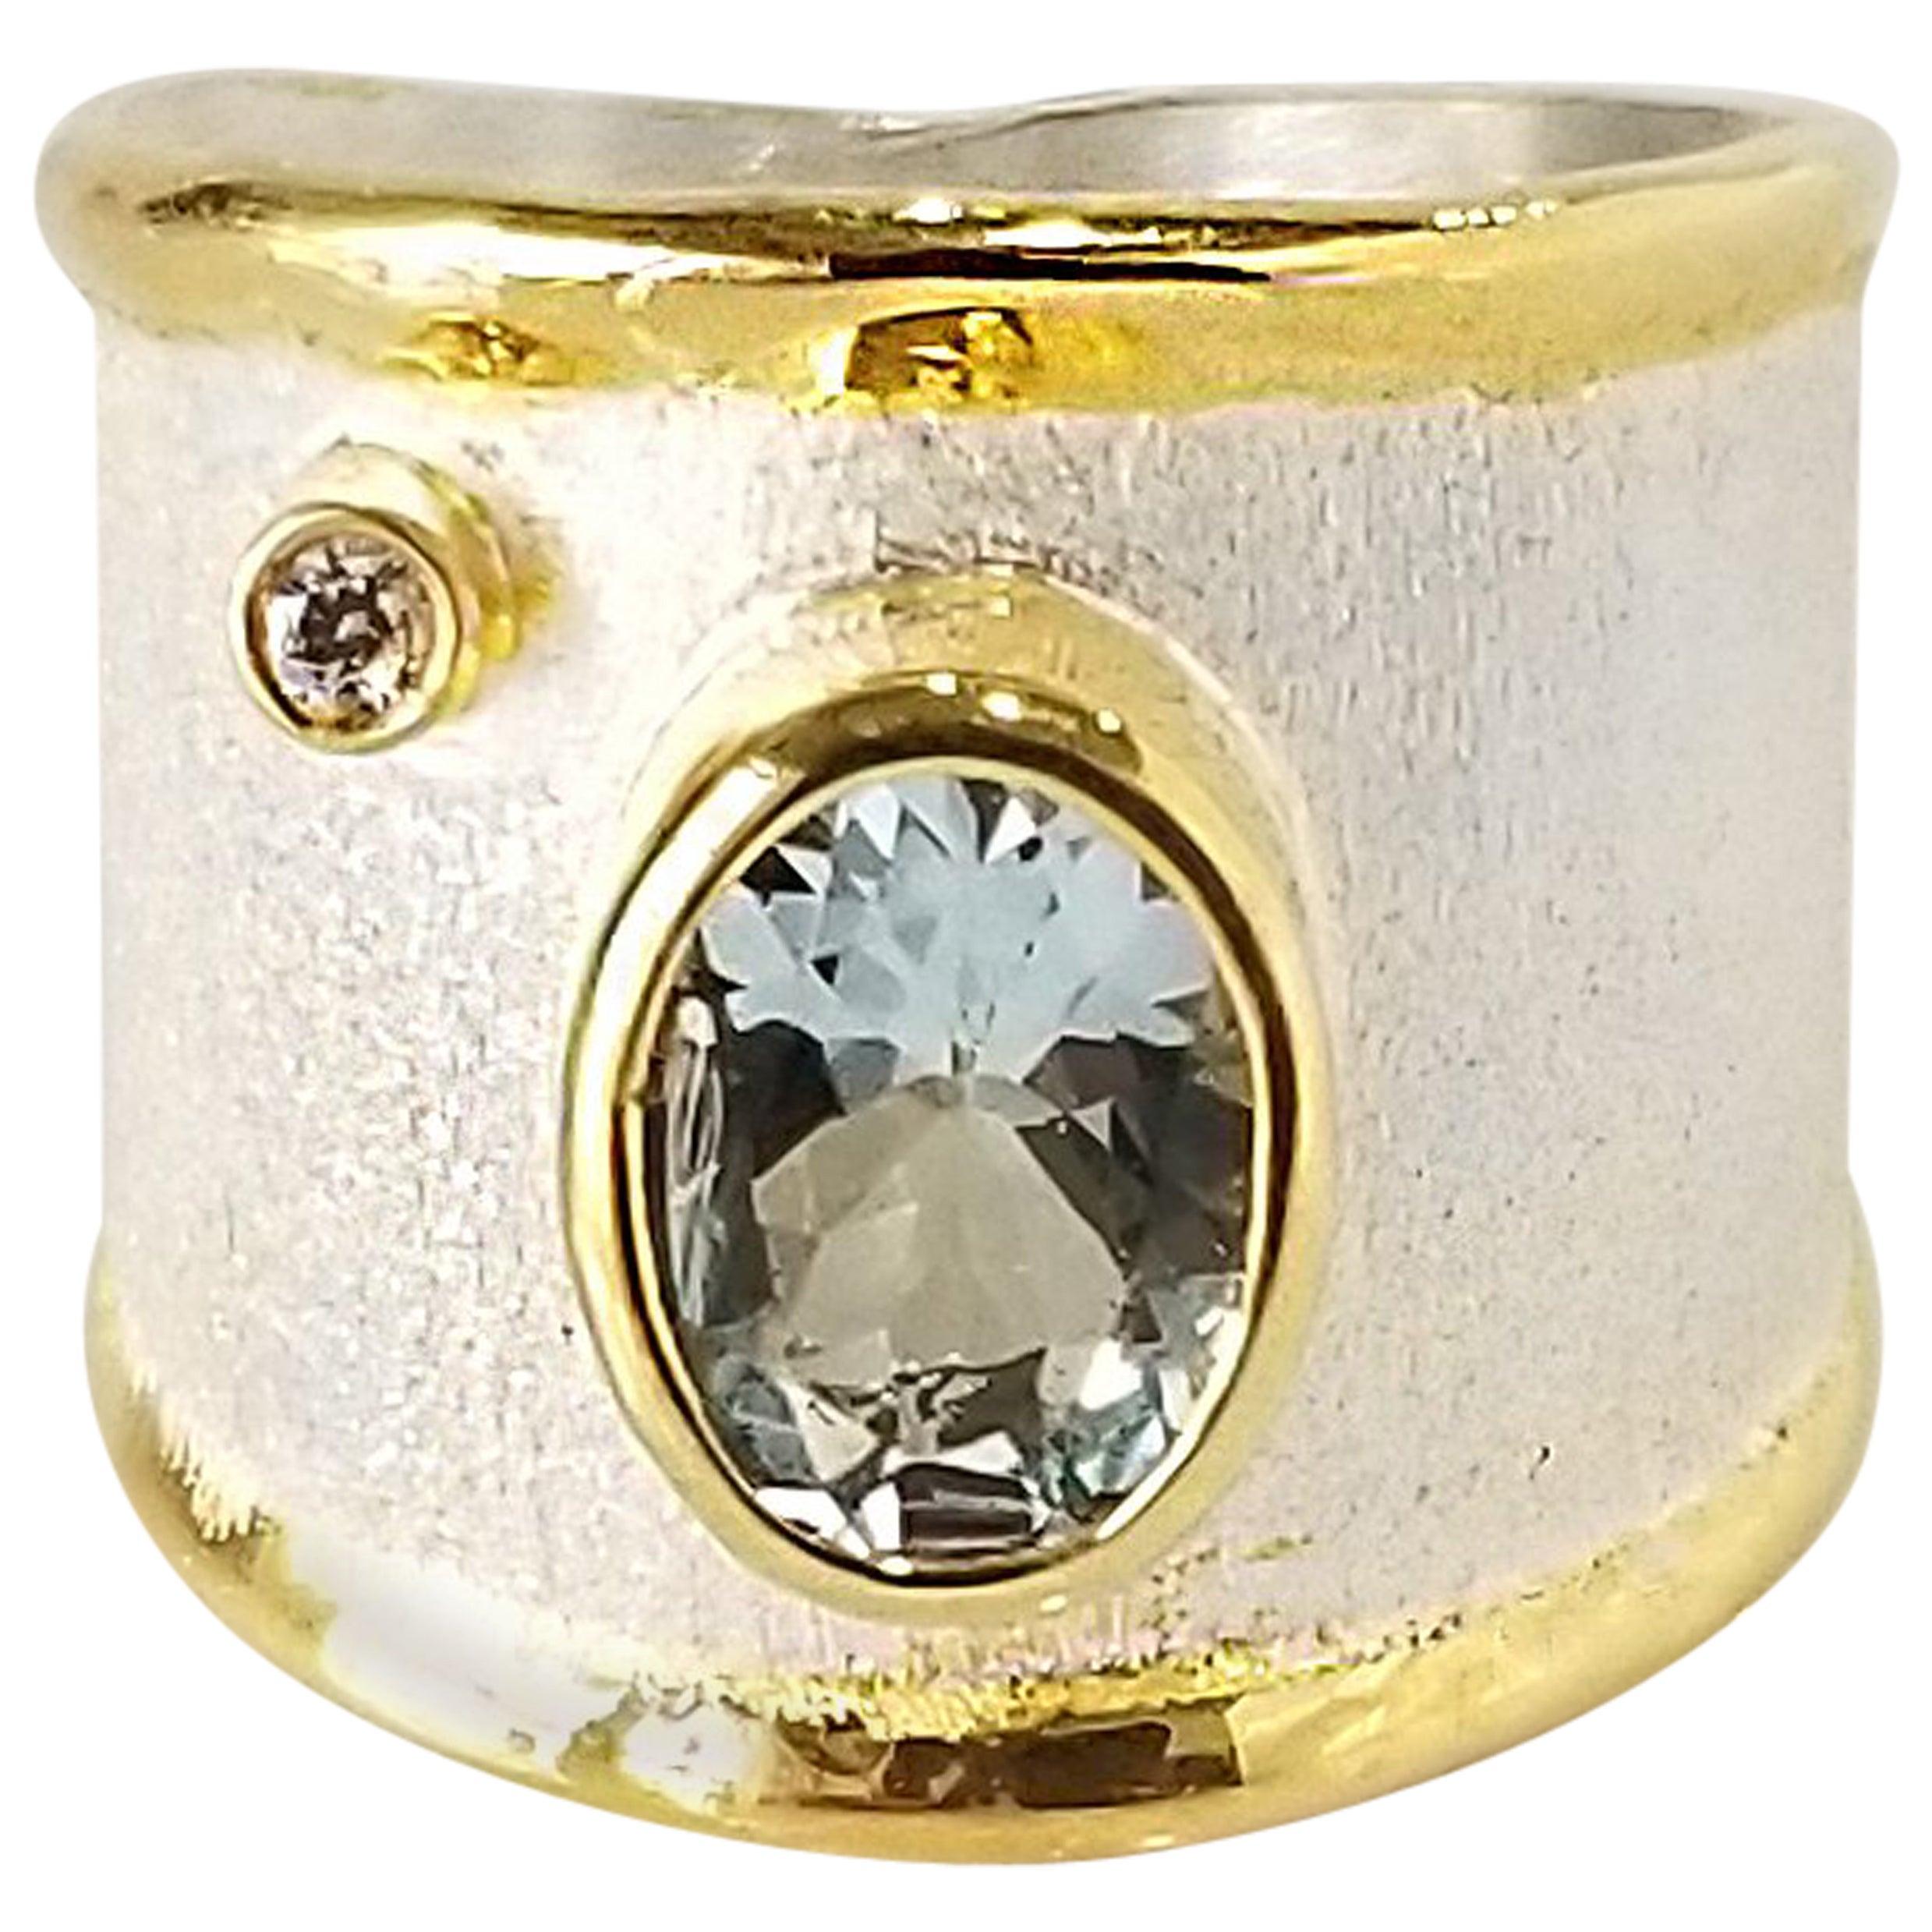 Yianni Creations 1.75 Carat Aquamarine Diamond Fine Silver 24 Karat Gold Ring